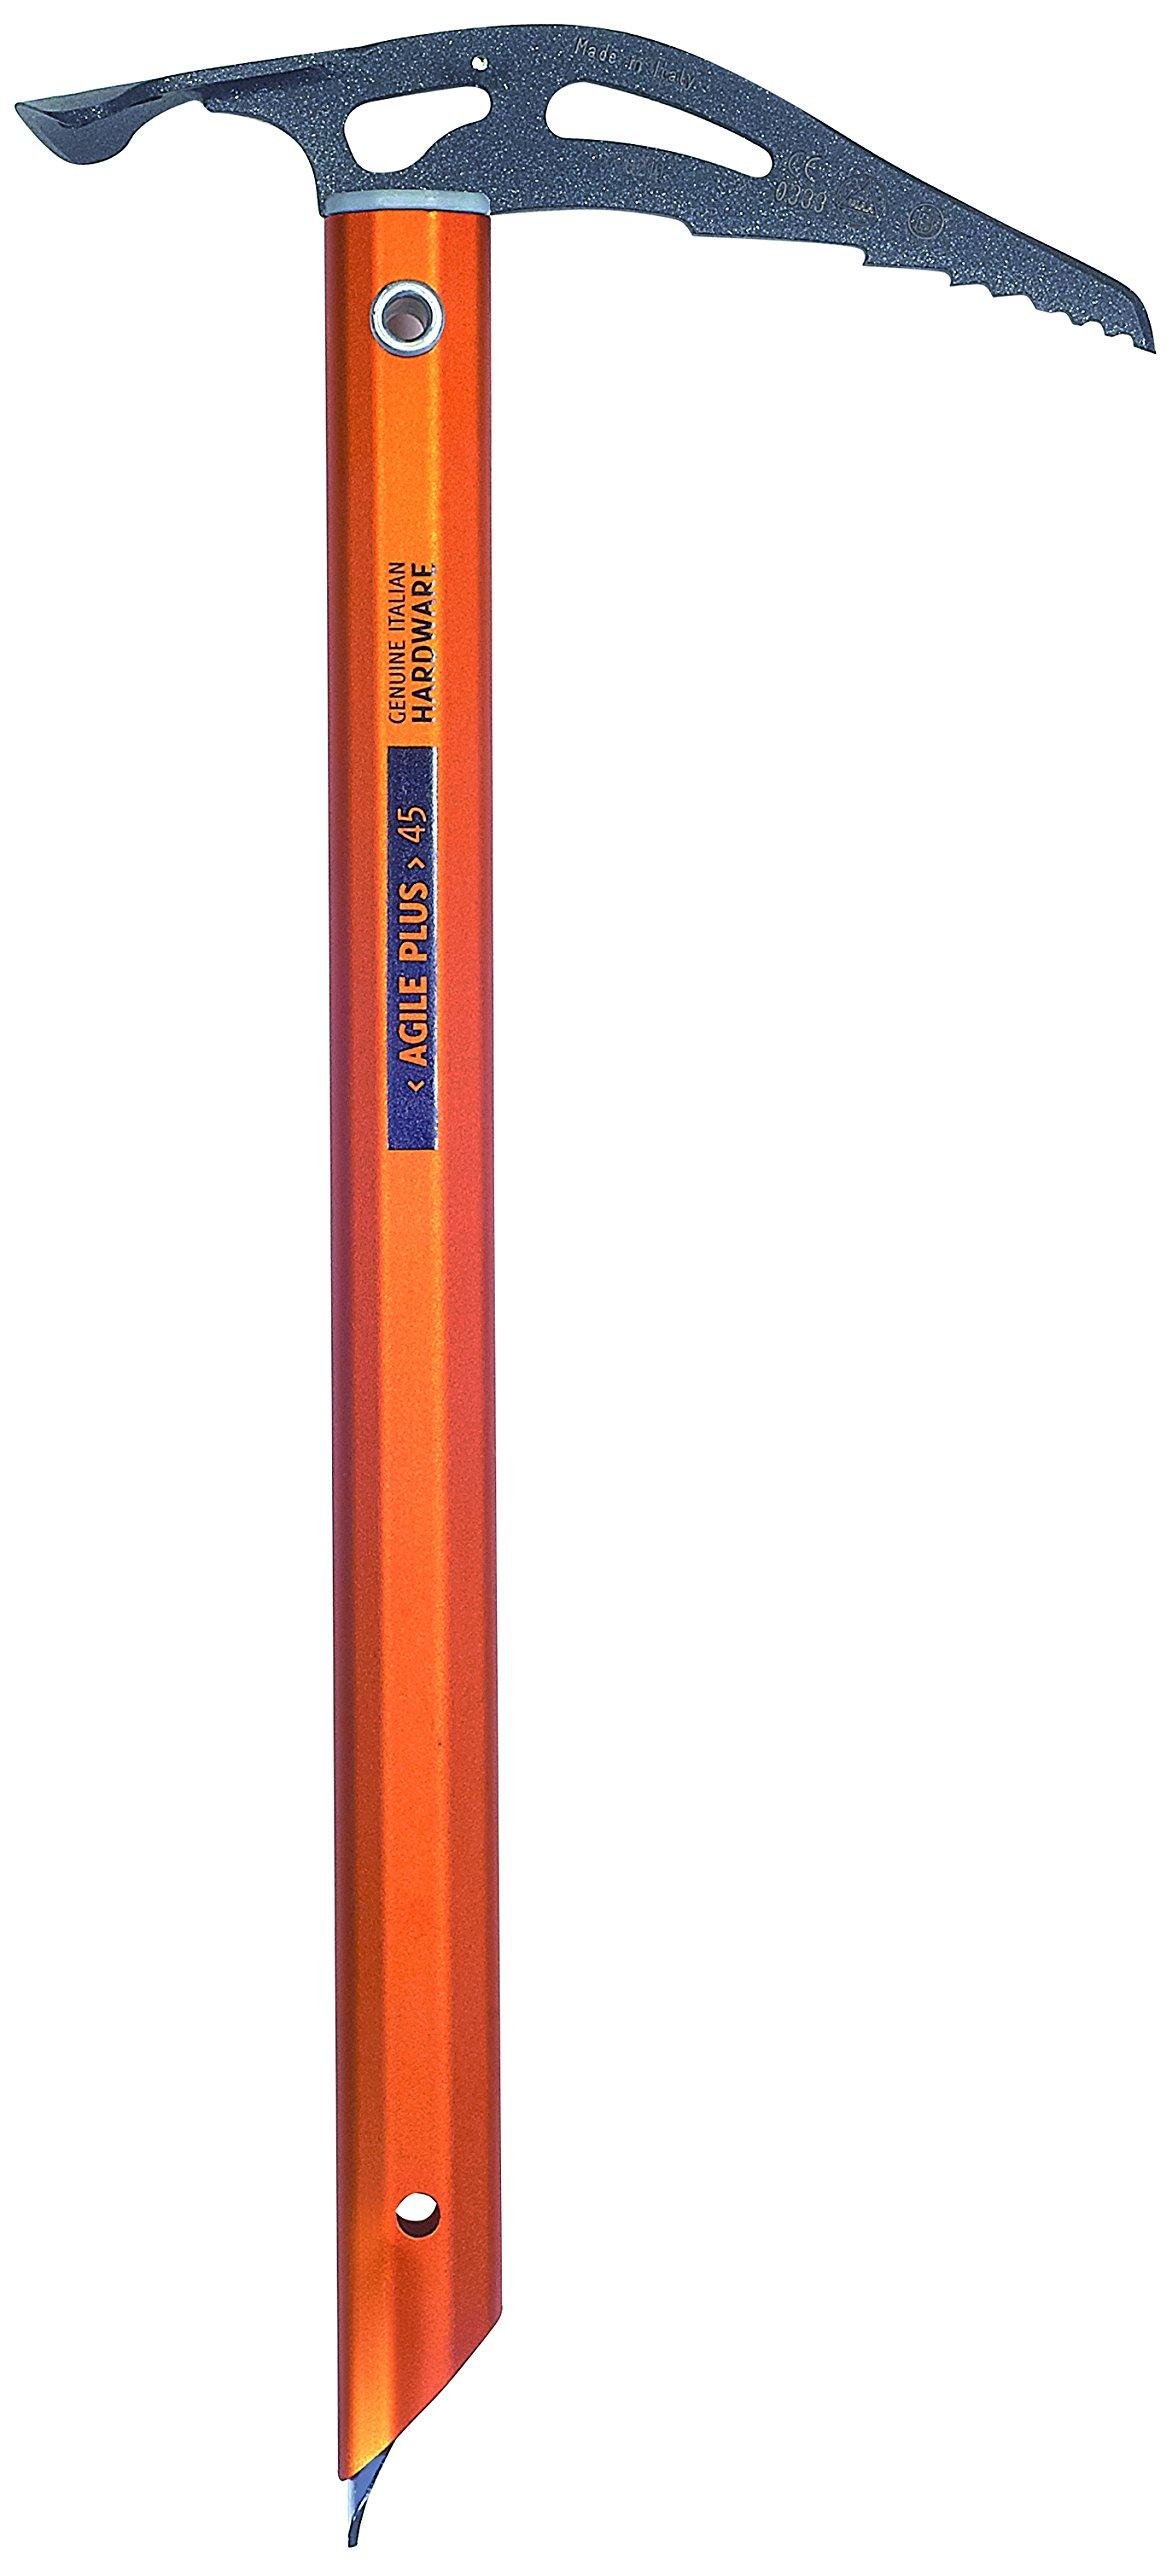 Climbing Technology Agile Plus Ice Axe Länge 55 cm steel, orange